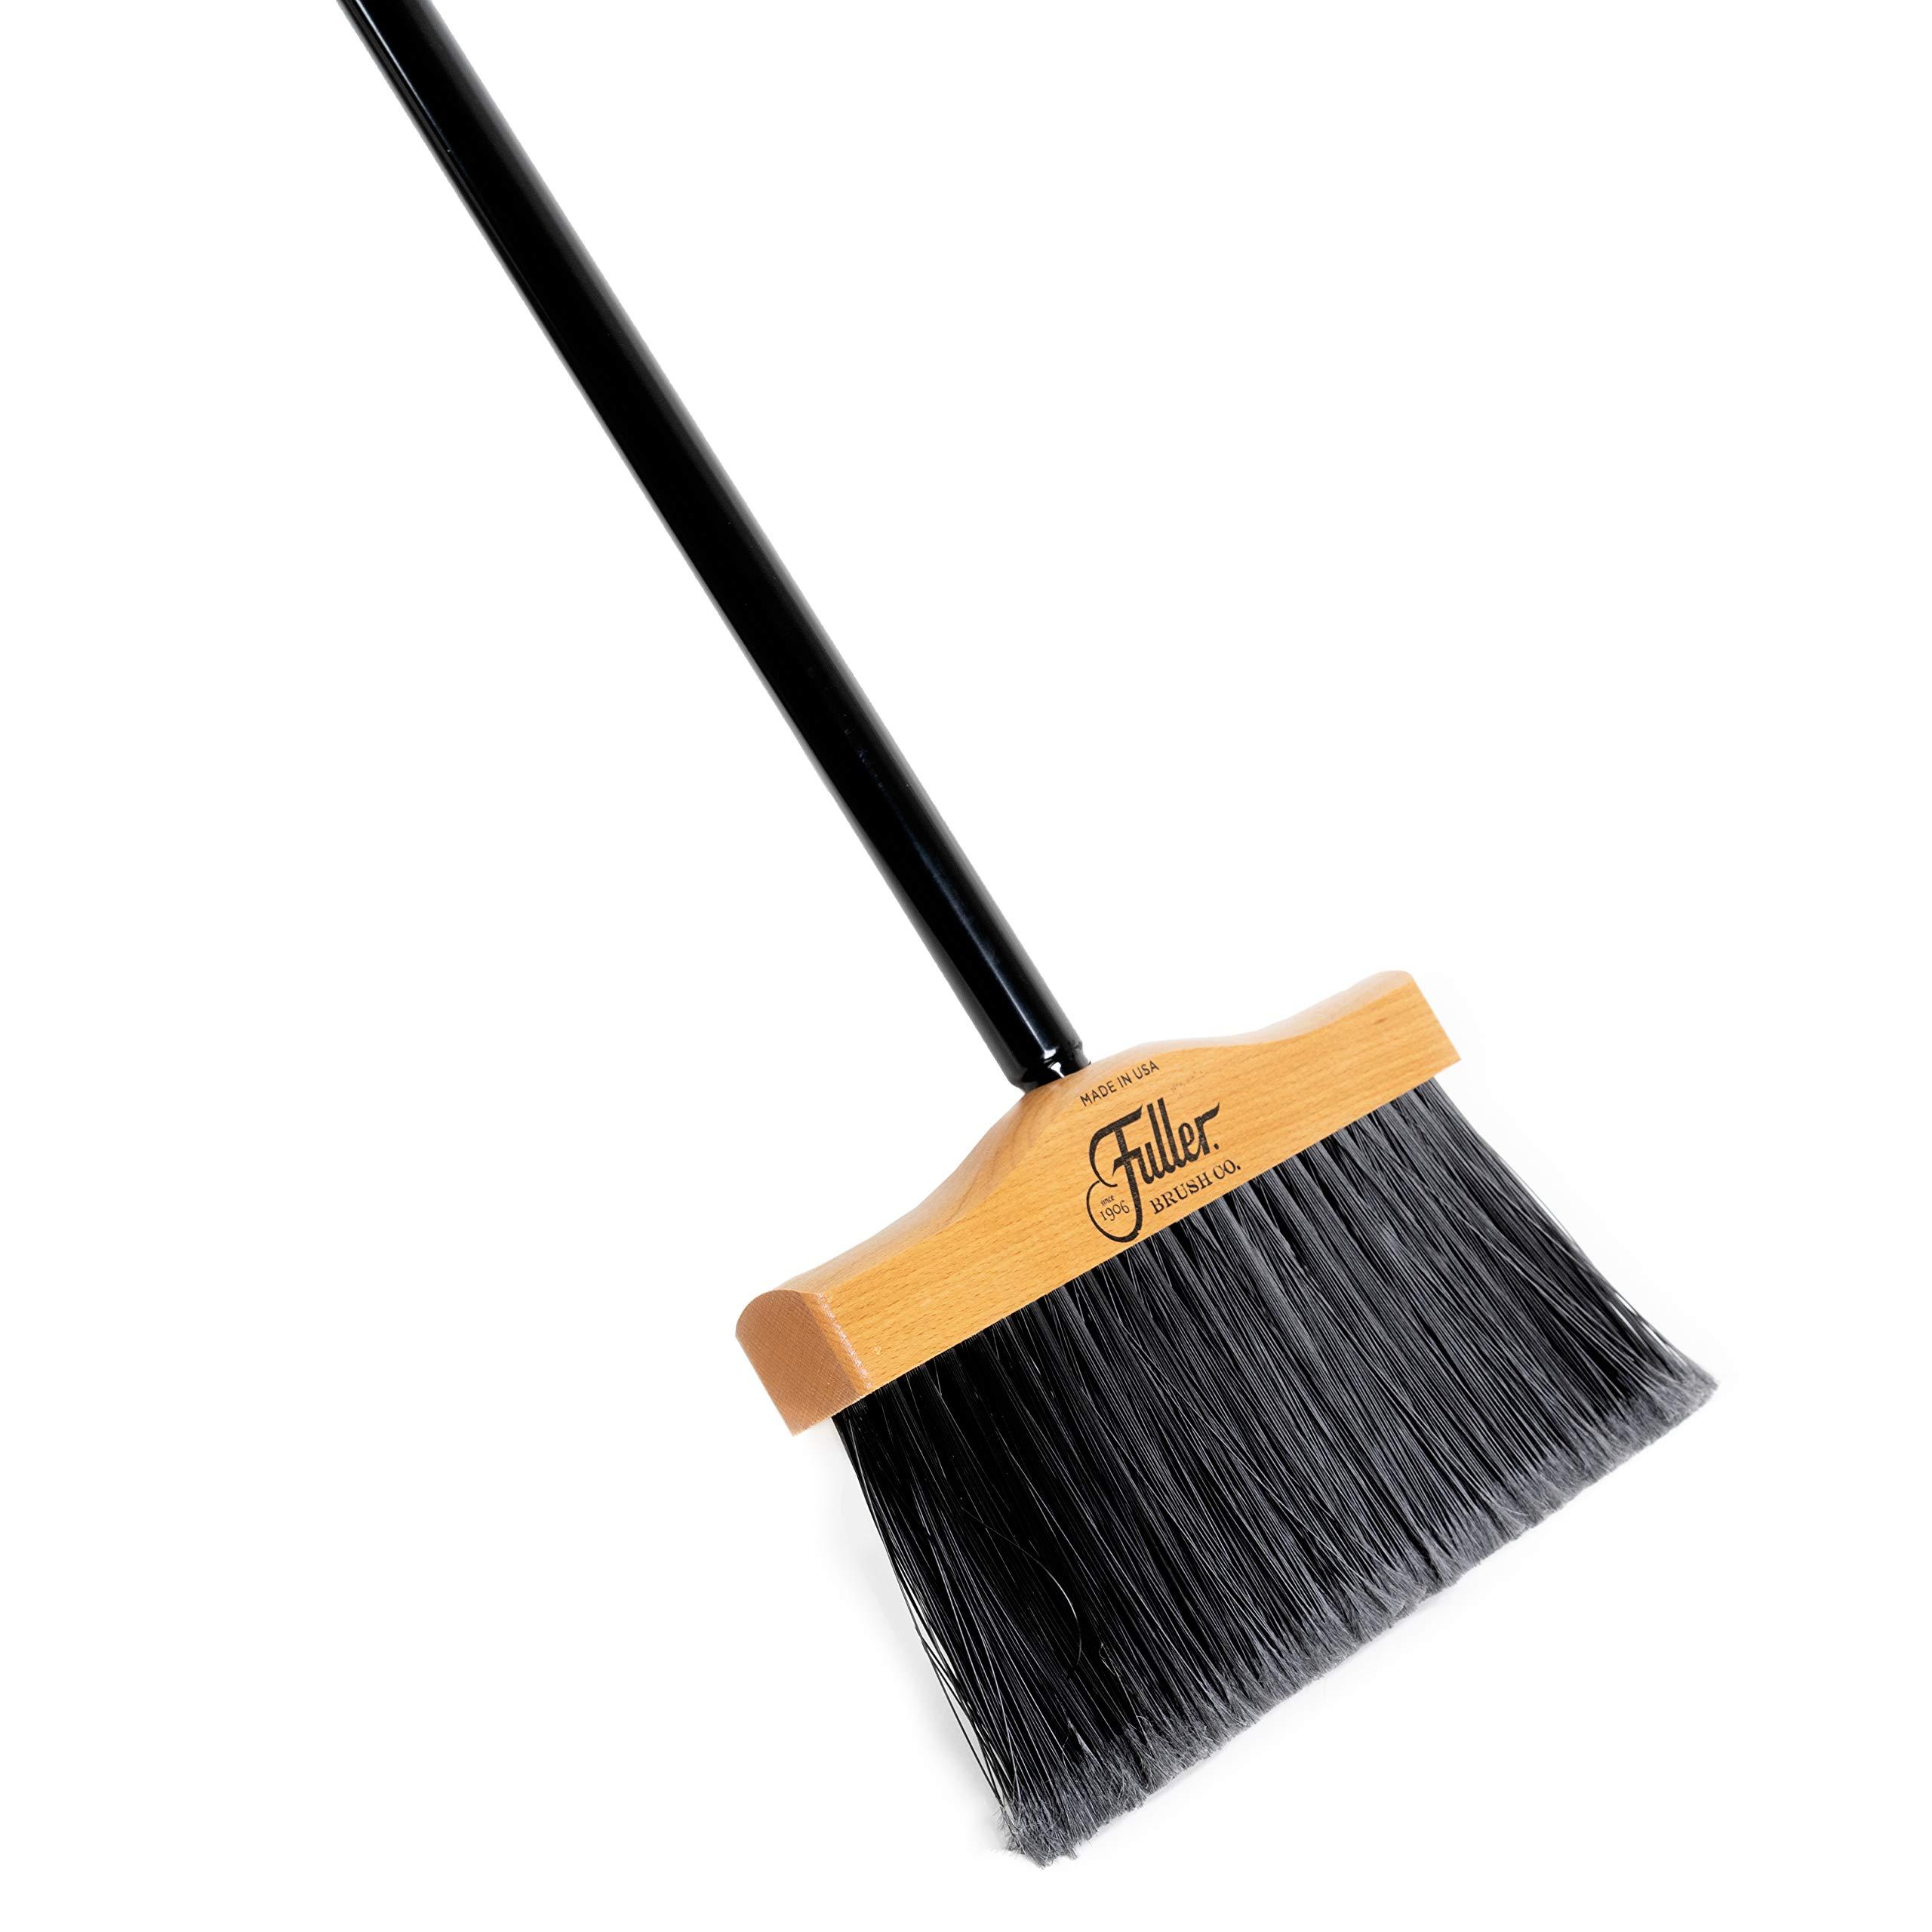 Fuller Brush Indoor/Outdoor Broom - Heavy Duty Wide Wooden Sweeper w/Long Bristles - Commercial Floor Brush for Salon, Shop, Kitchen & Garage - 10-inch Wide by Fuller Brush